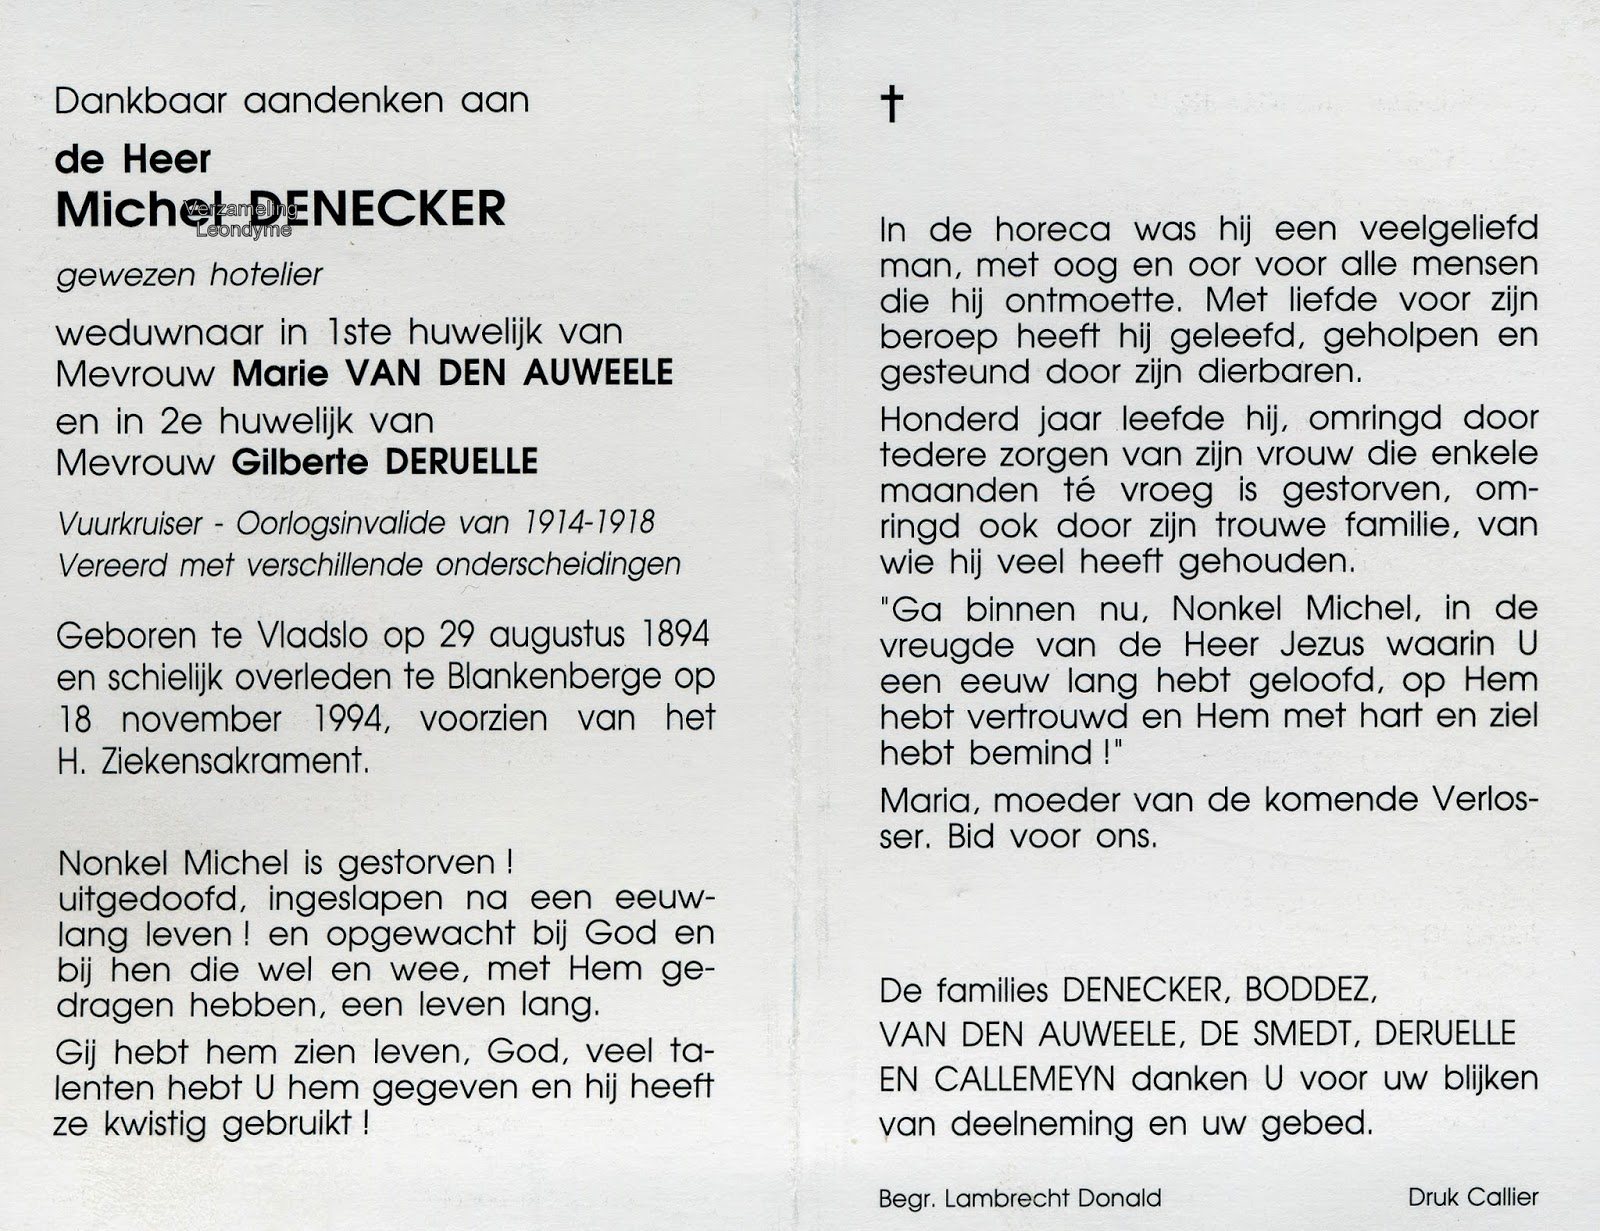 Bidprentje, Michel Denecker 1894-1994. Verzameling Leondyme